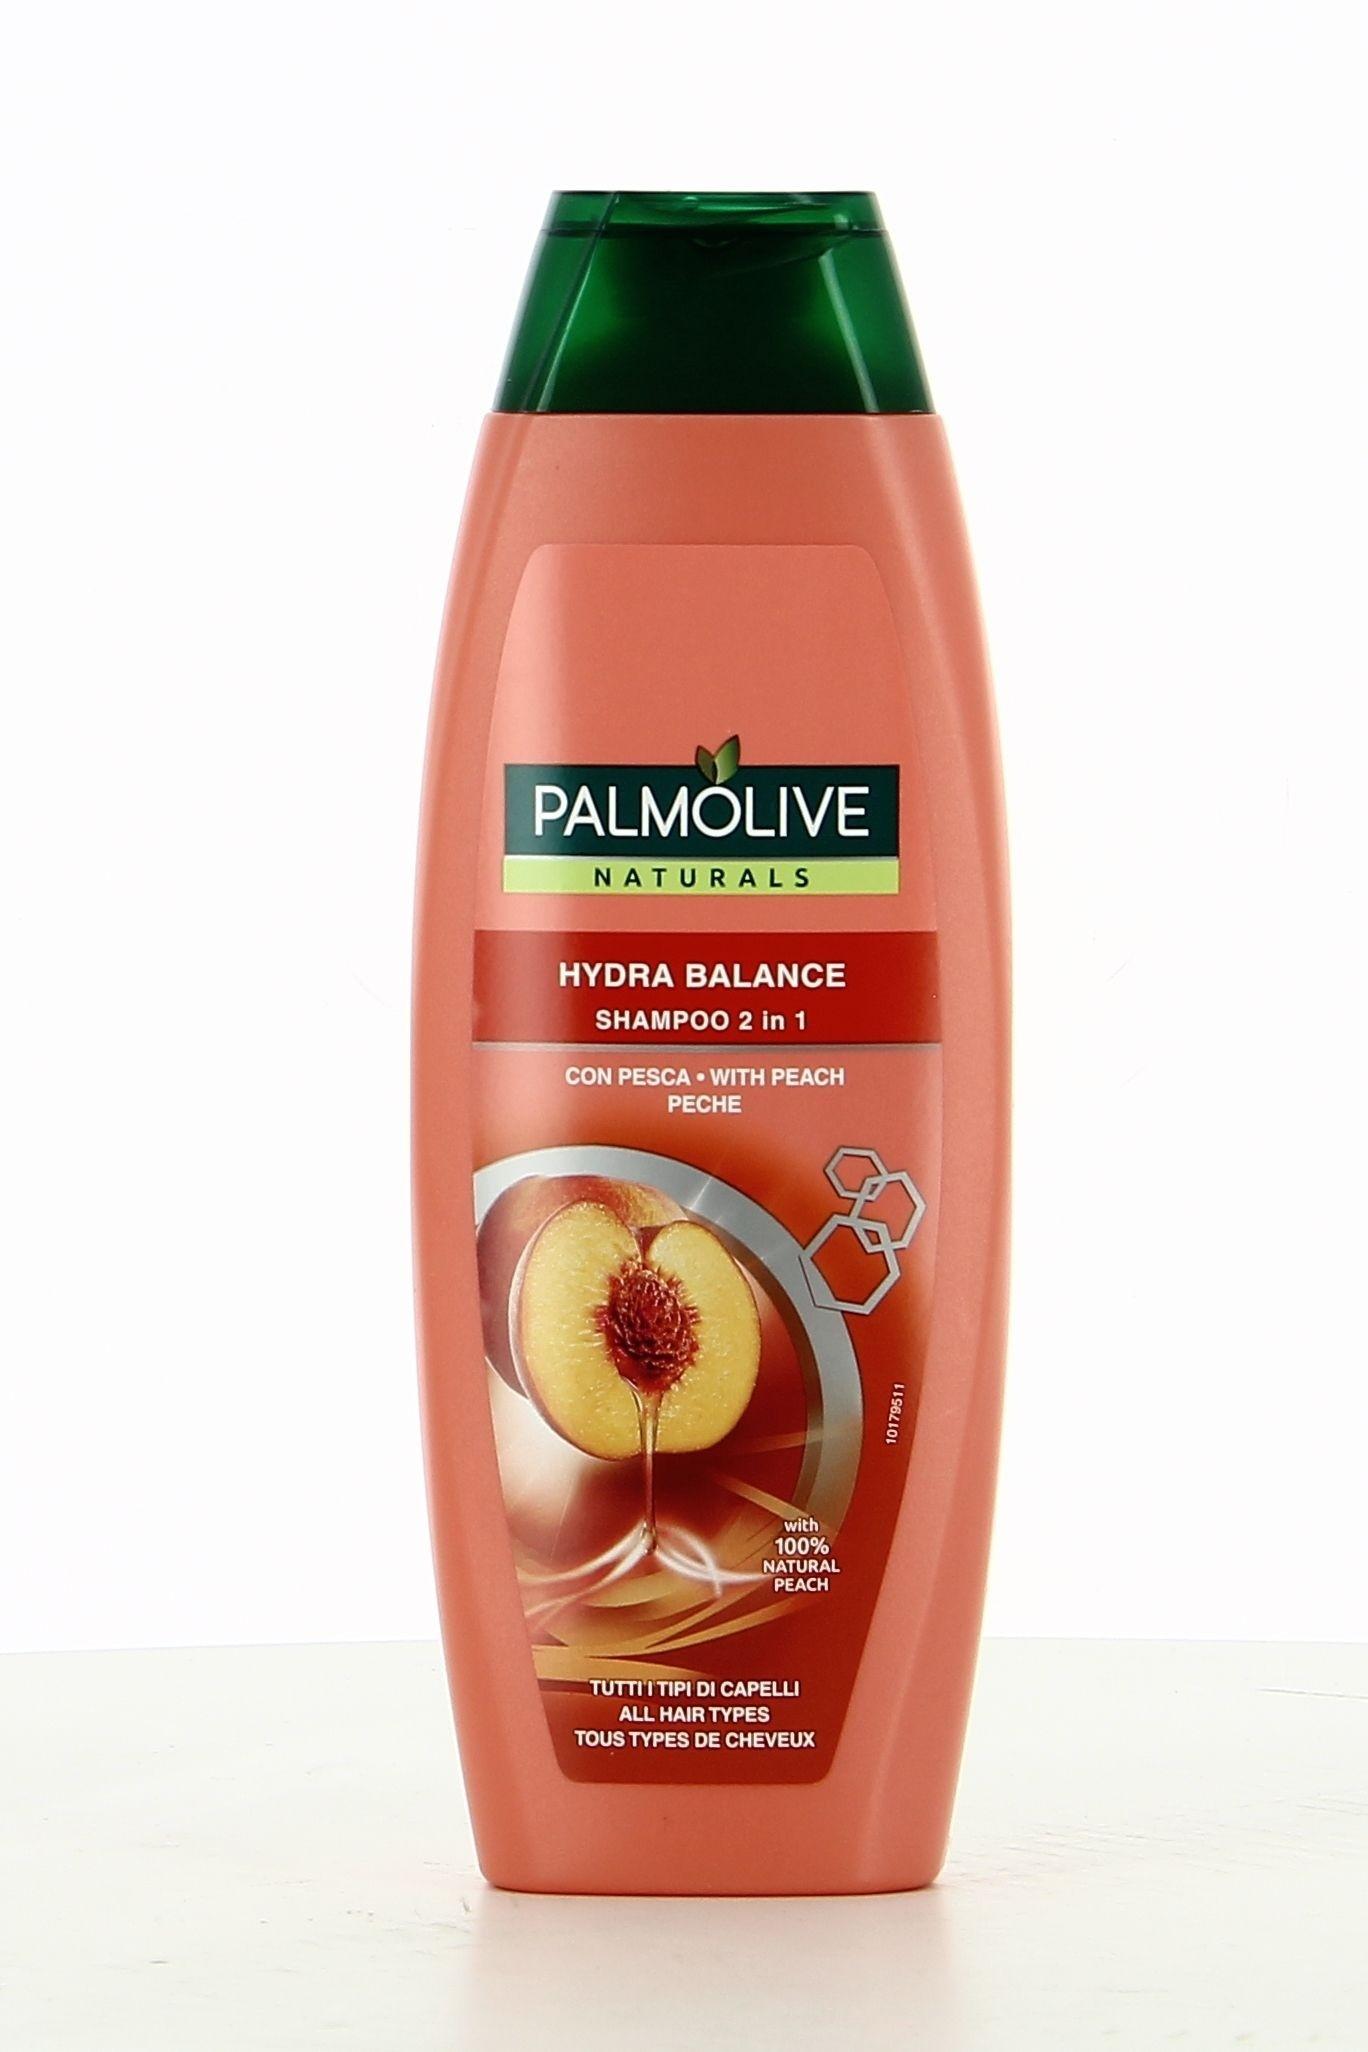 Shampoing Palmolive hydra balance (nat 2in1) 350 ml